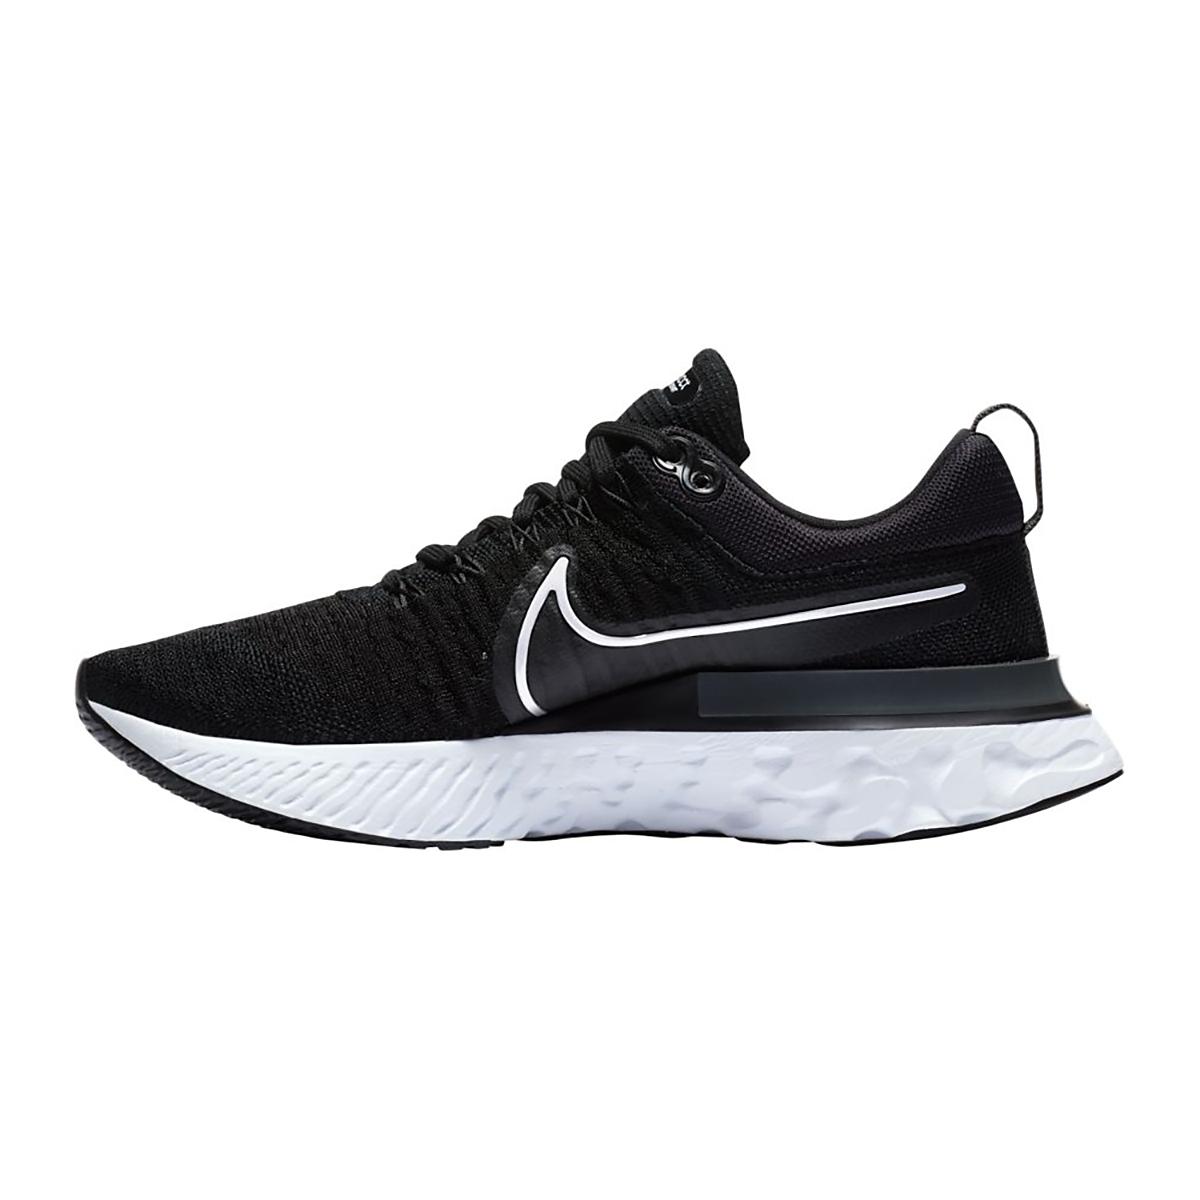 Women's Nike React Infinity Run Flyknit 2 Running Shoe - Color: Black/White/Iron Grey - Size: 5 - Width: Regular, Black/White/Iron Grey, large, image 2